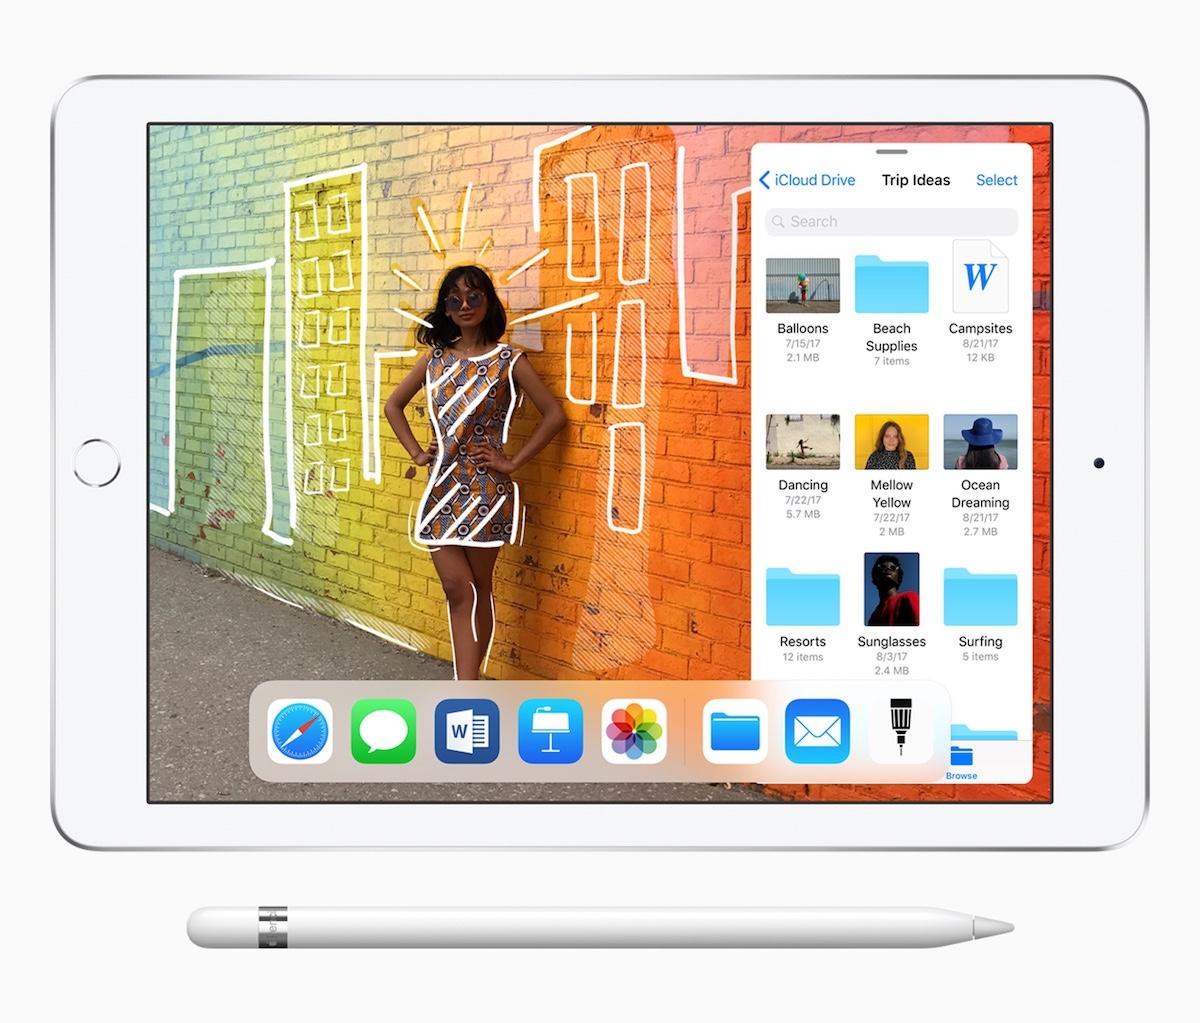 Nuevo modelo de iPad de 9,7 pulgadas